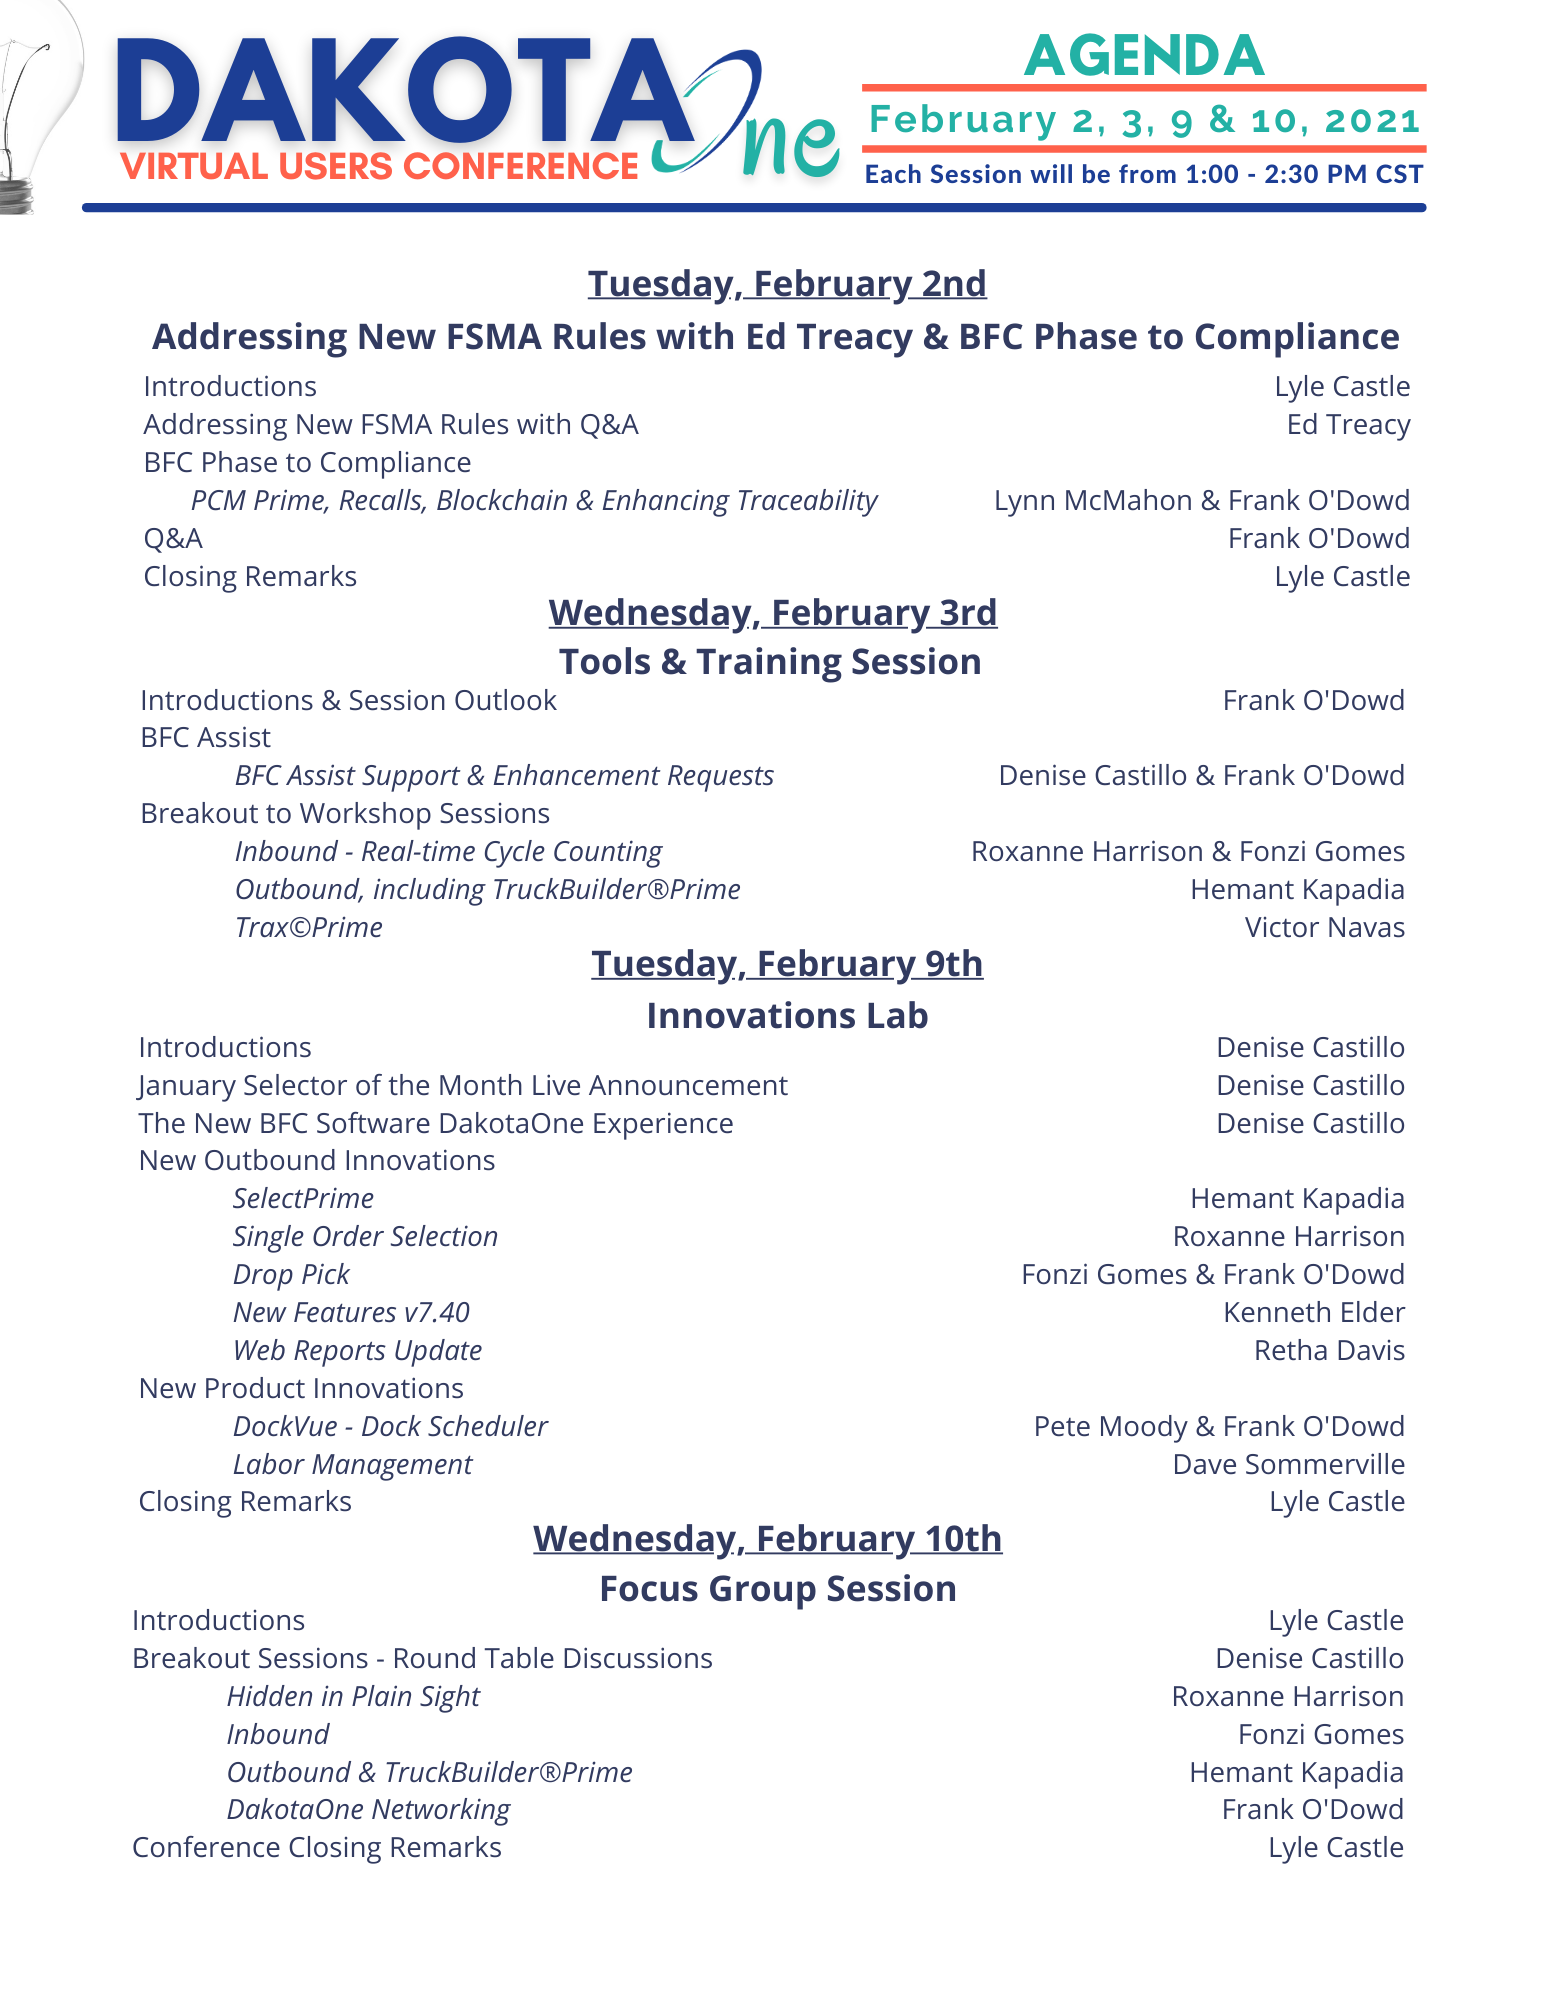 2021 DakotaOne Virtual Conference Agenda v2